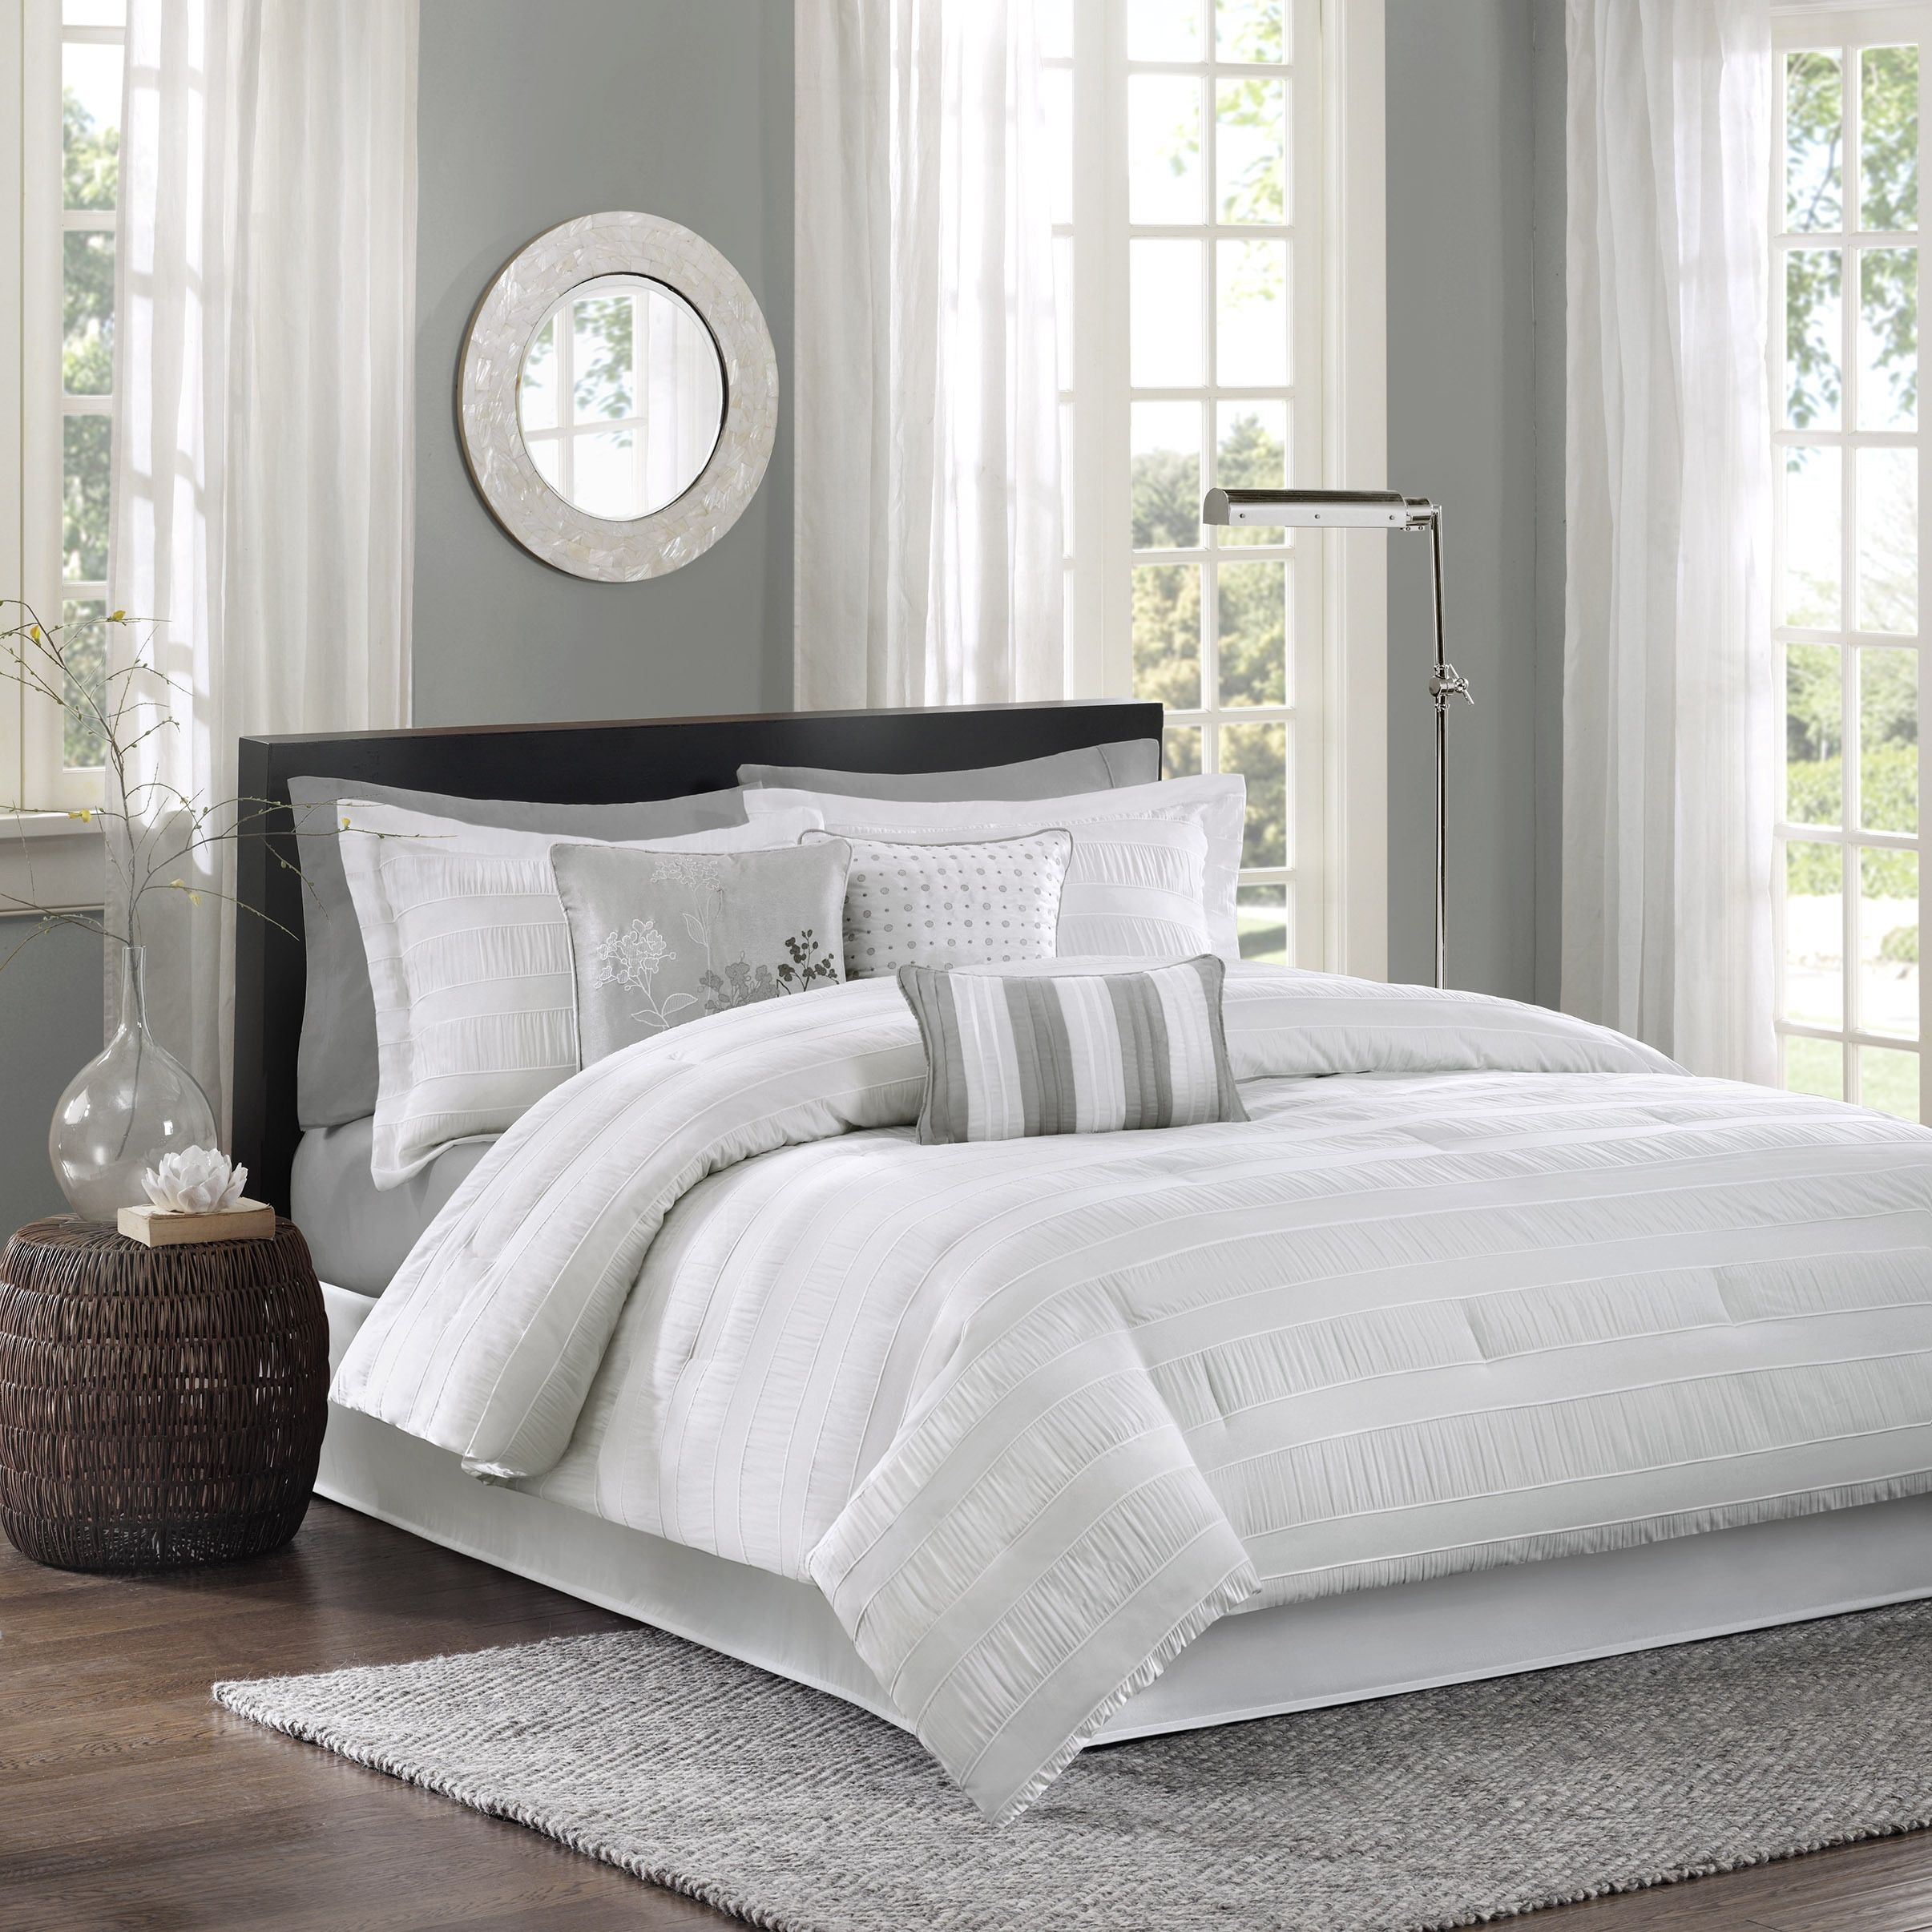 size ap black realtree comforters set king camouflage yhst sets comforter